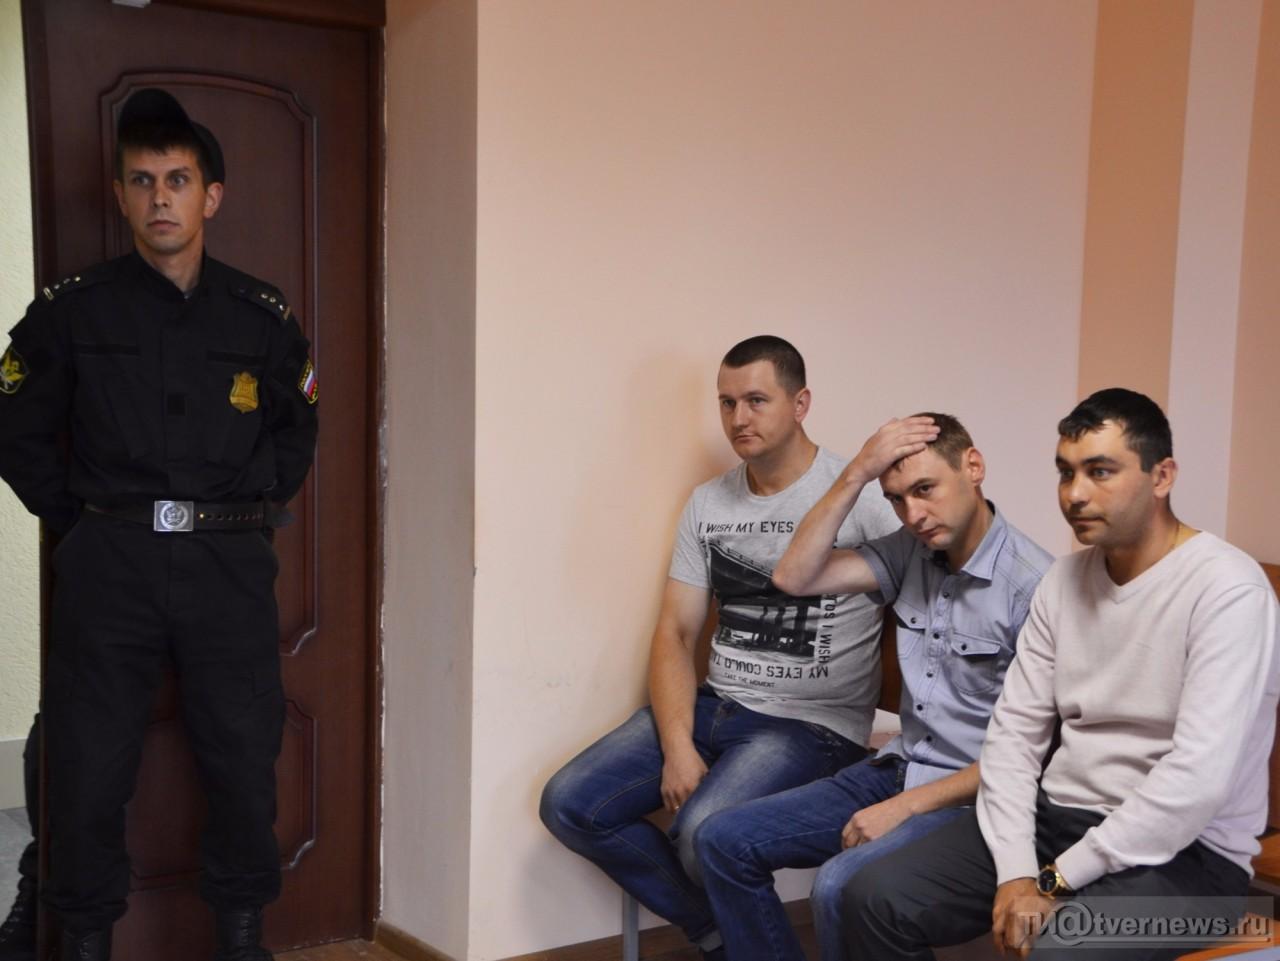 В Твери начался суд над смоленскими сотрудниками ДПС, остановившими прокурора за тонировку